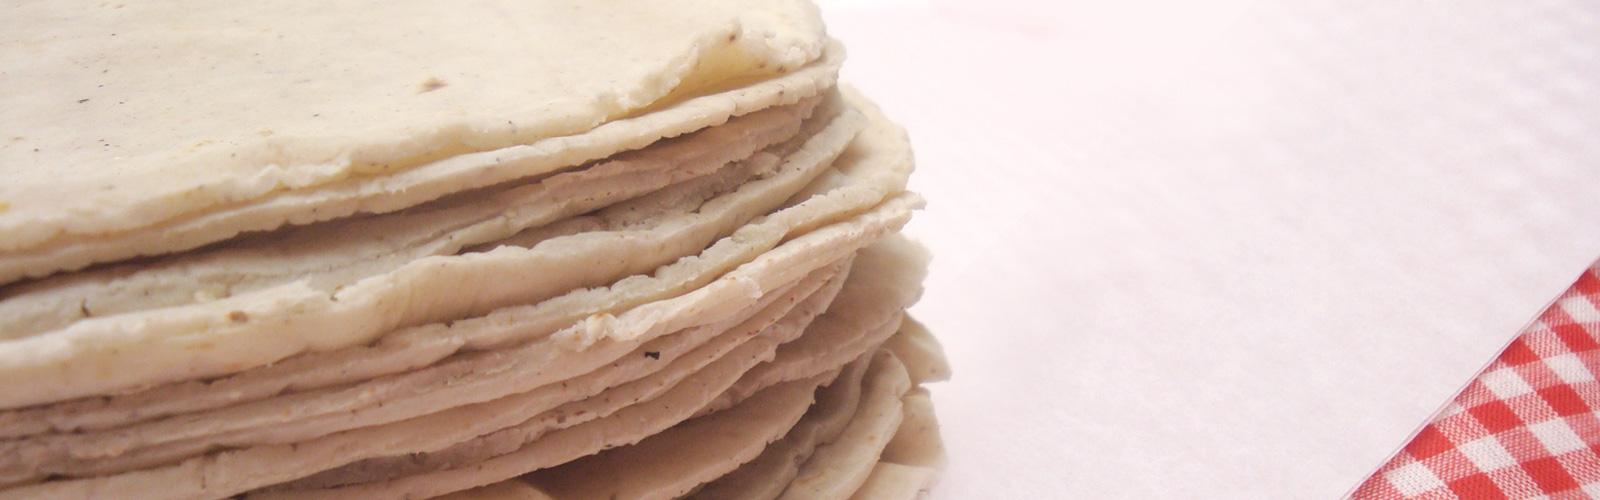 papel_tolteca_para_tortillas